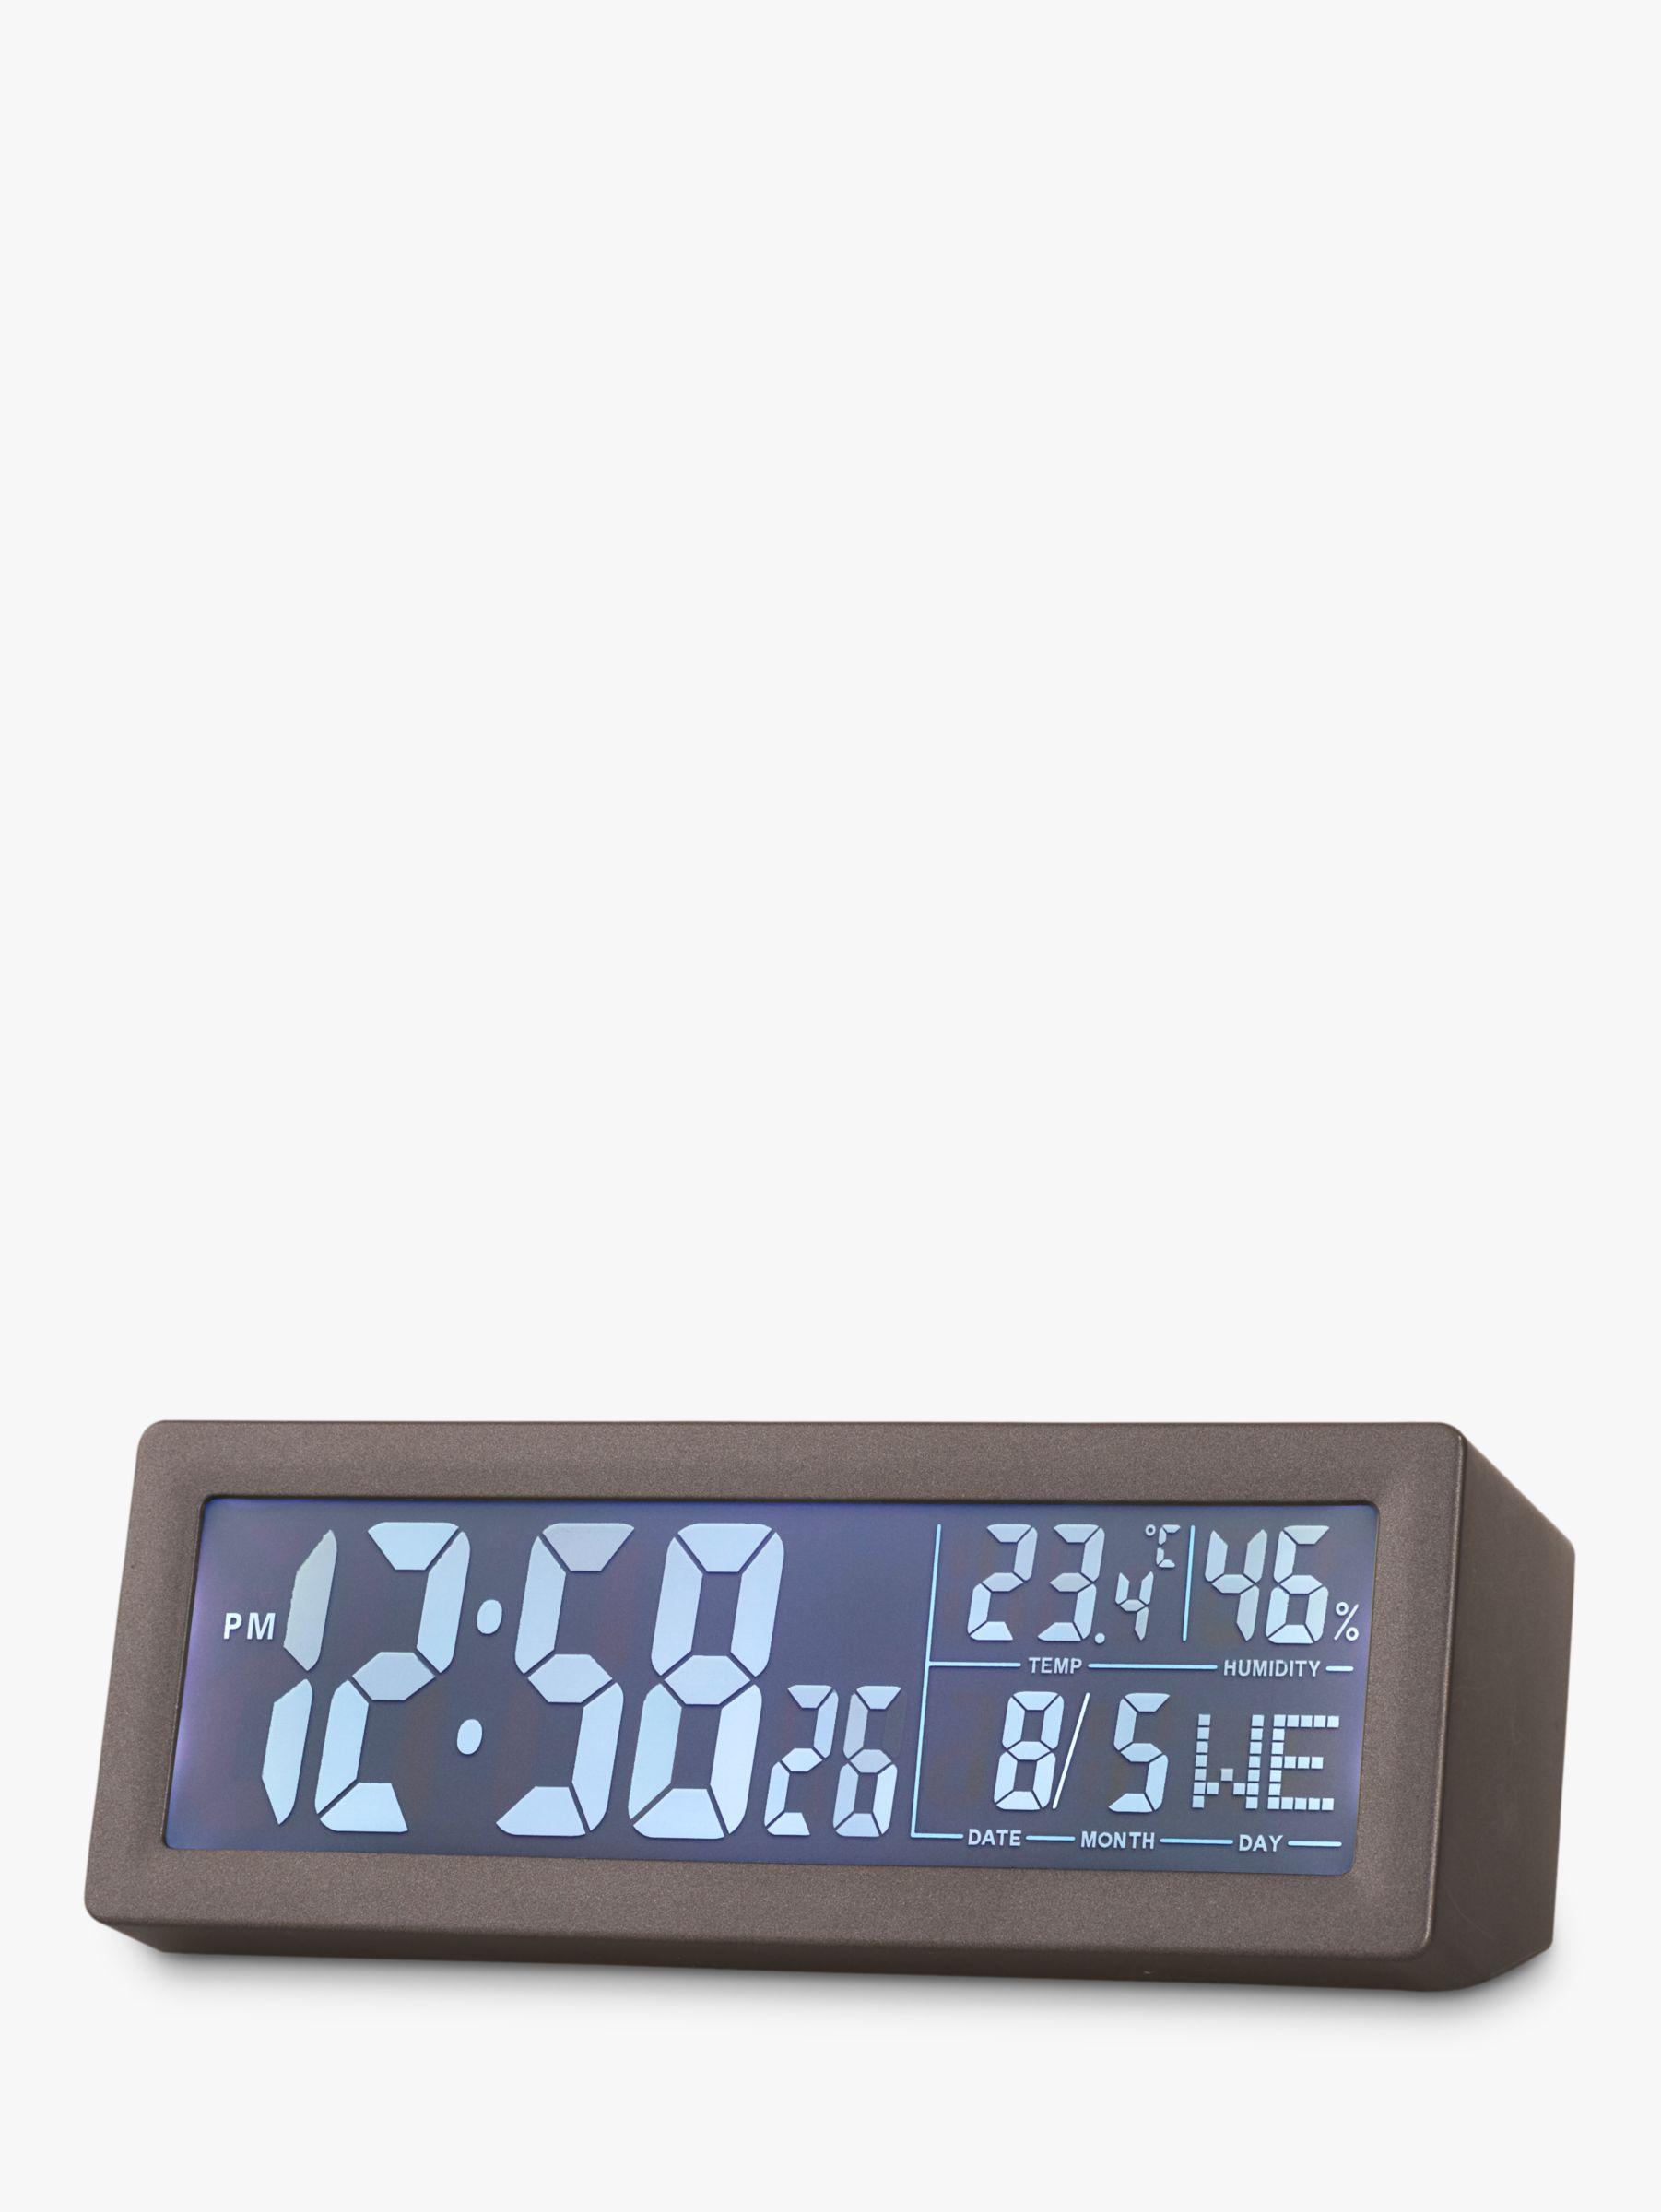 Acctim Acctim Karminski Reflection Display LCD Digital Alarm Clock, Dark Grey